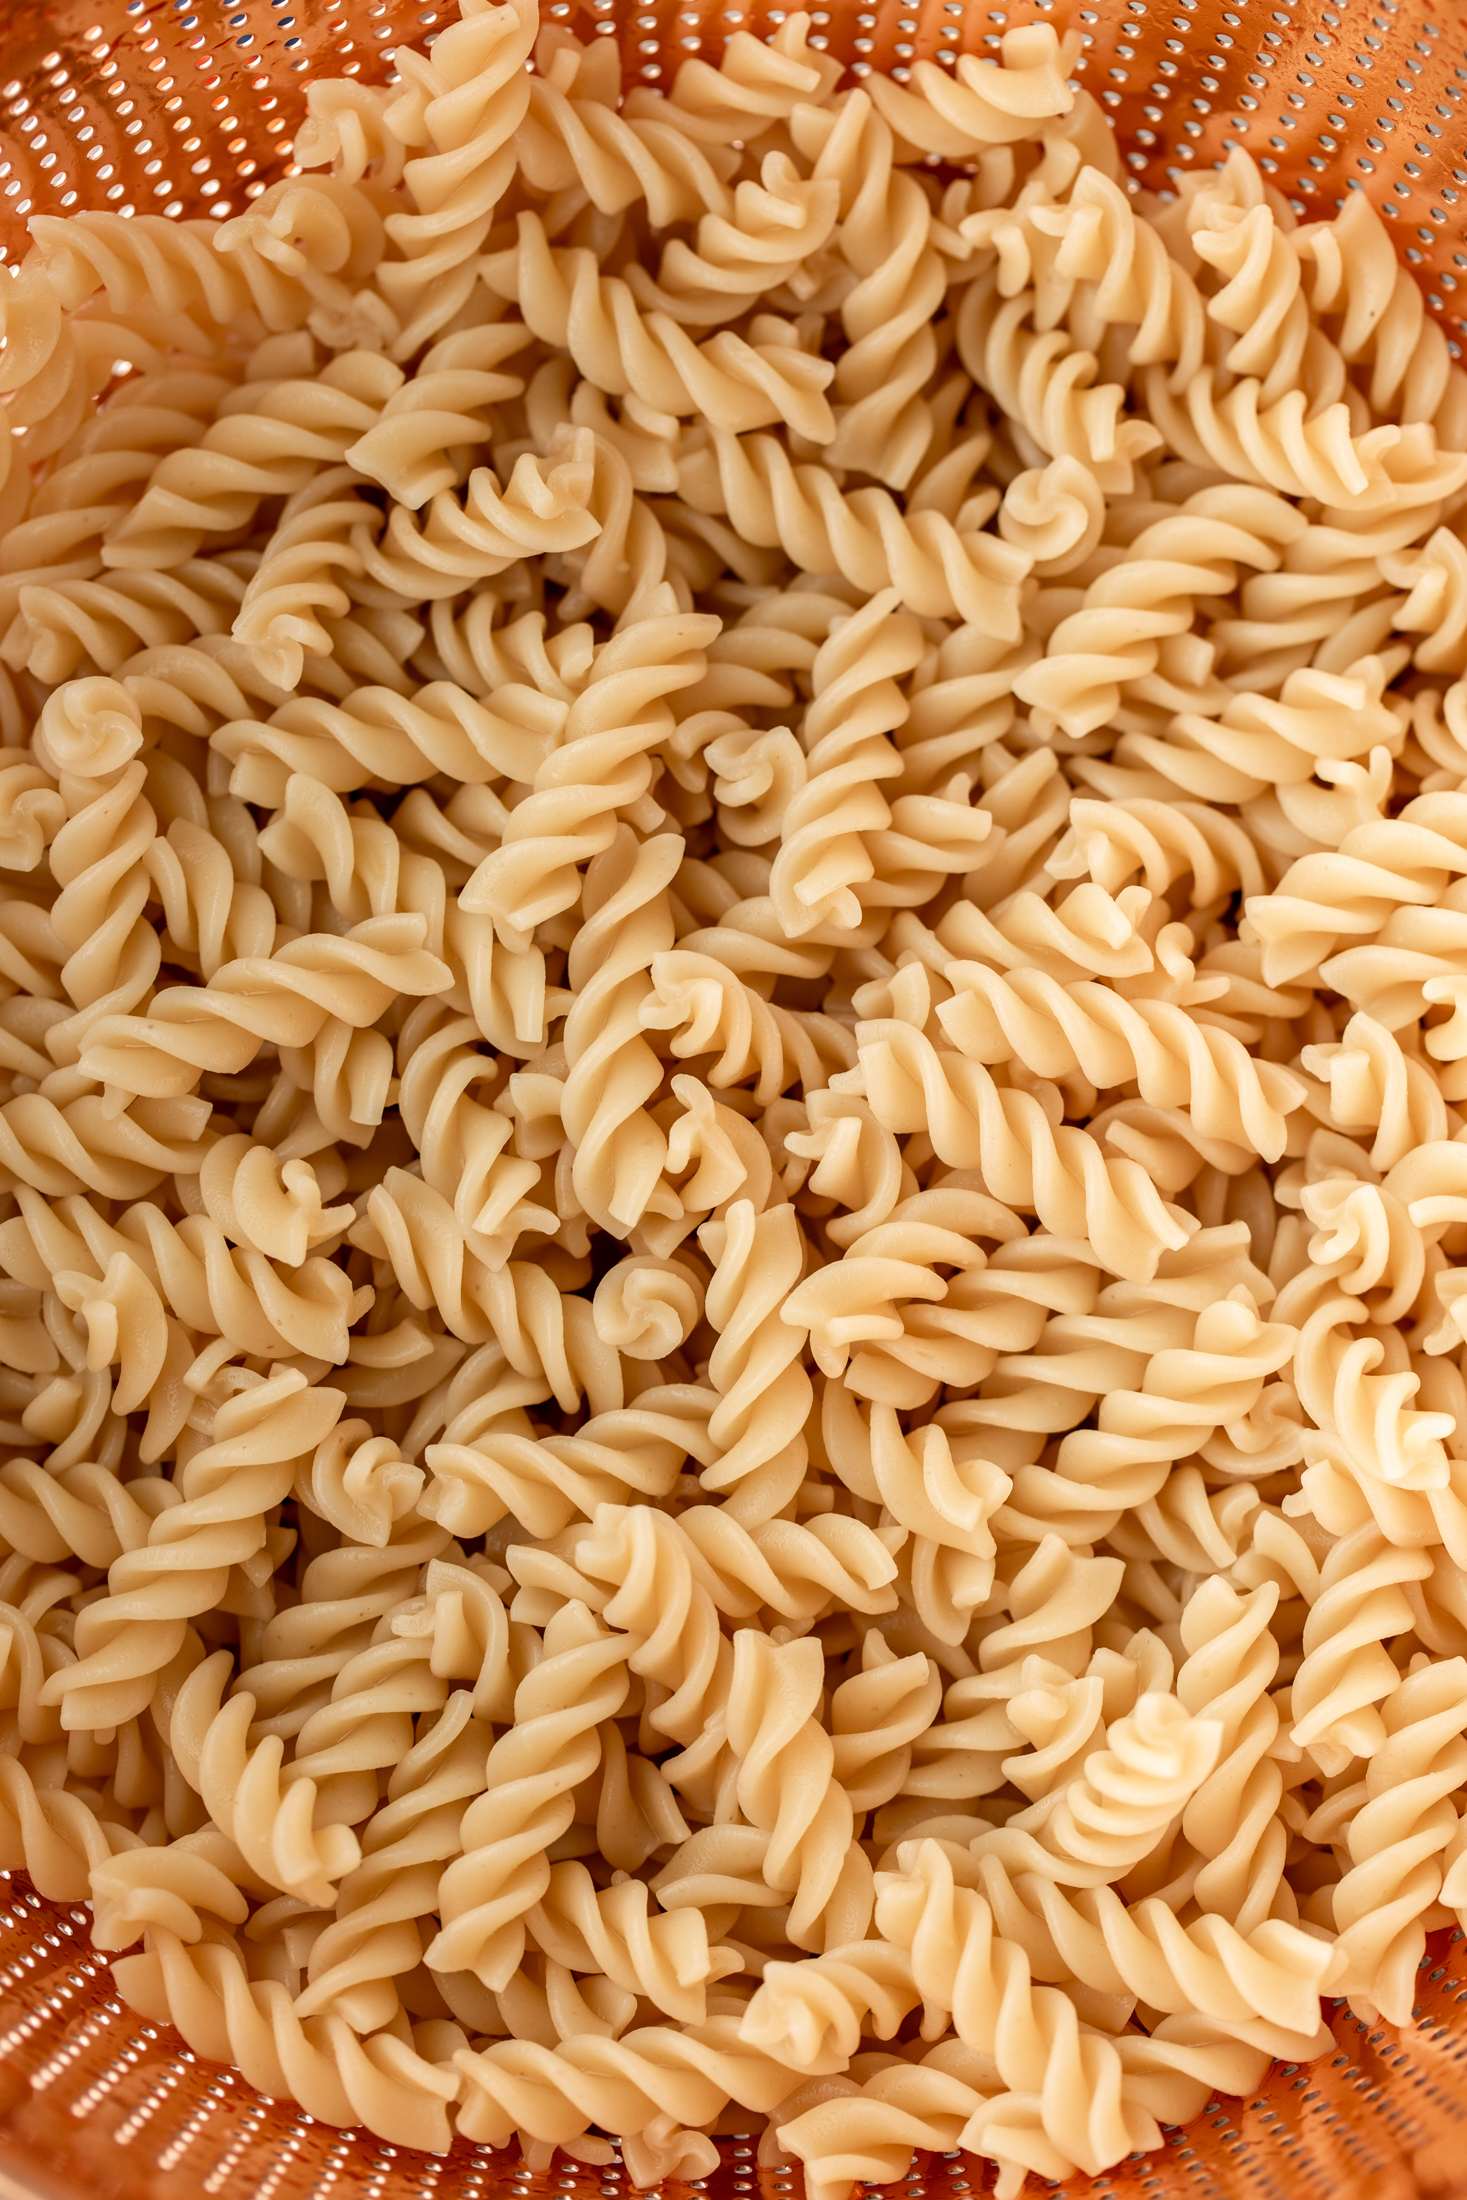 fusili noodles